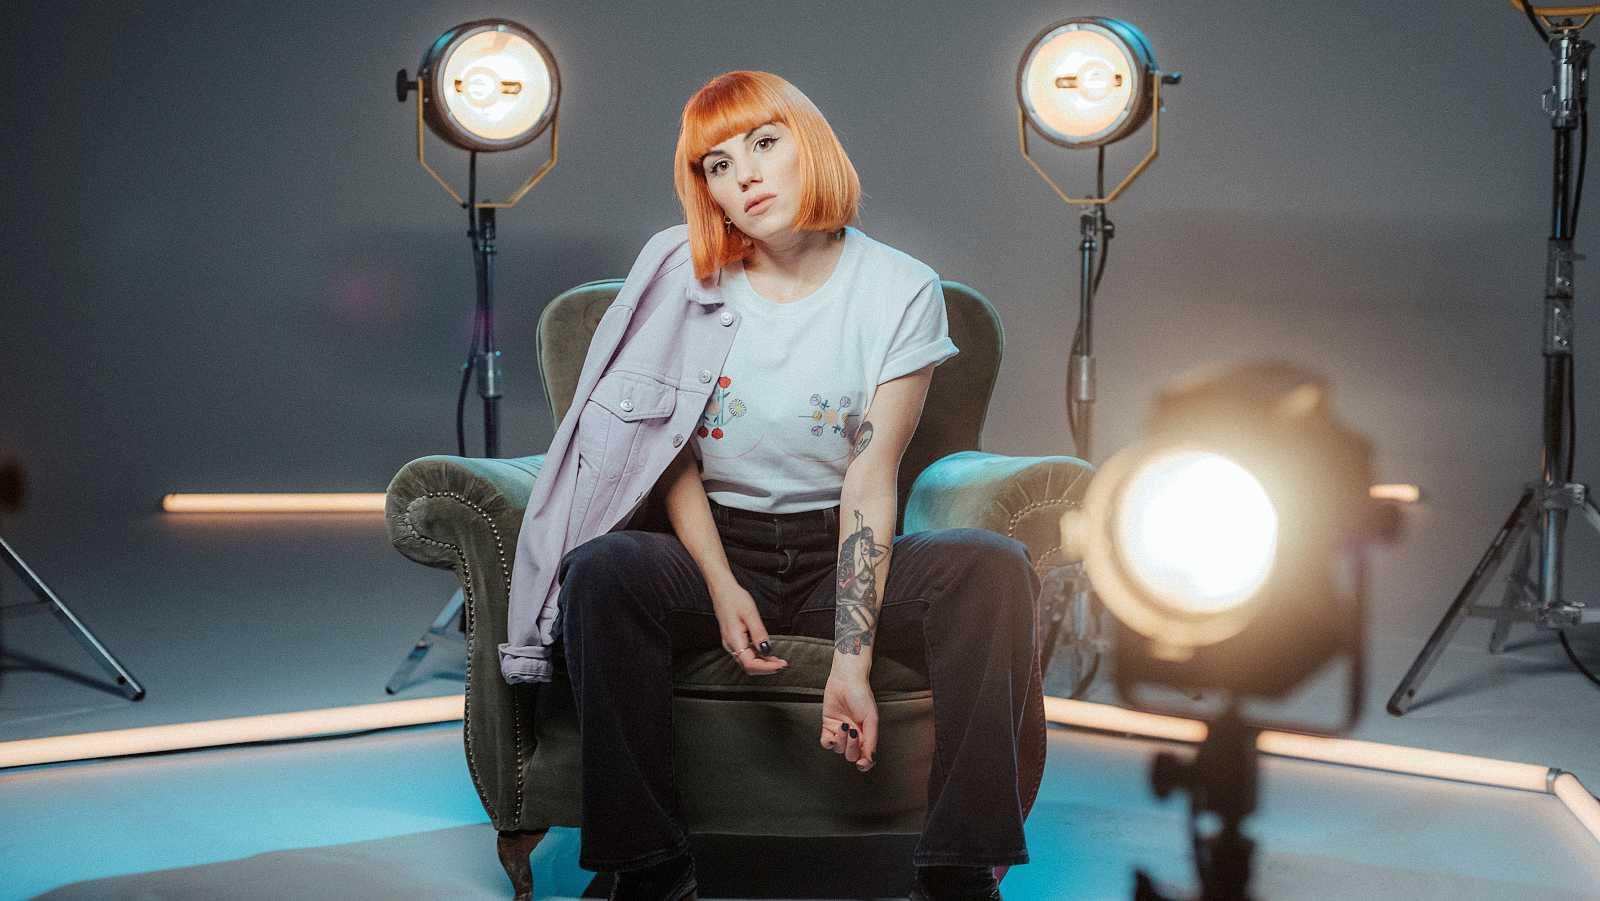 La artista Angy Fernández tiene once tatuajes